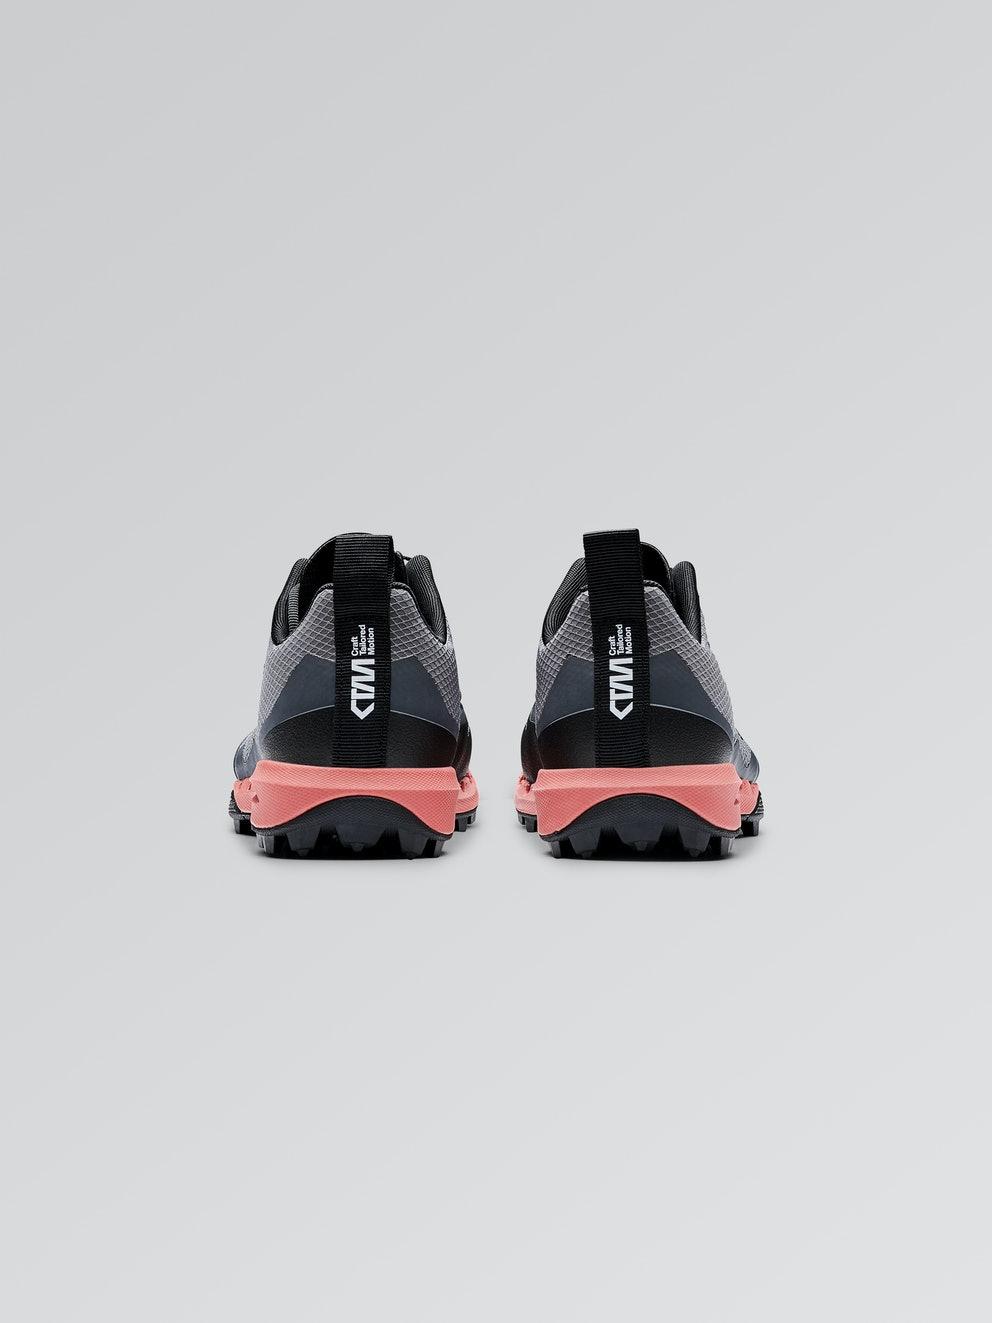 craft ocr ctm speed chaussure trail 7